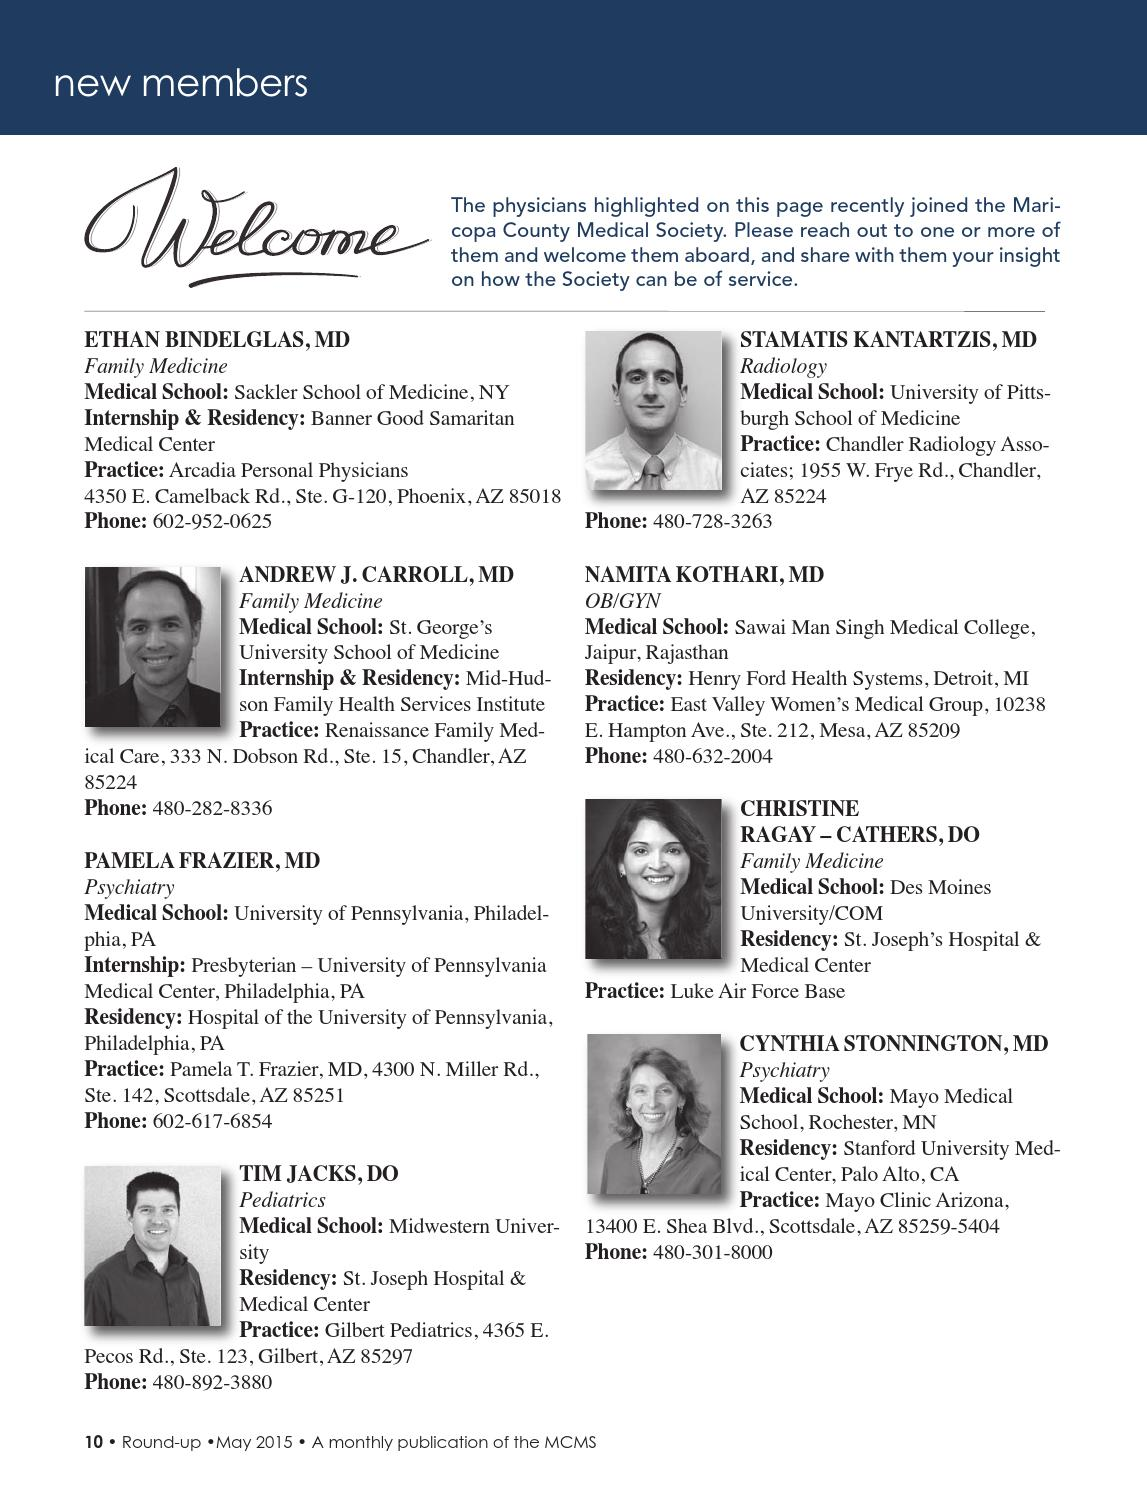 Round-up Magazine May 2015 by Maricopa County Medical Society - issuu